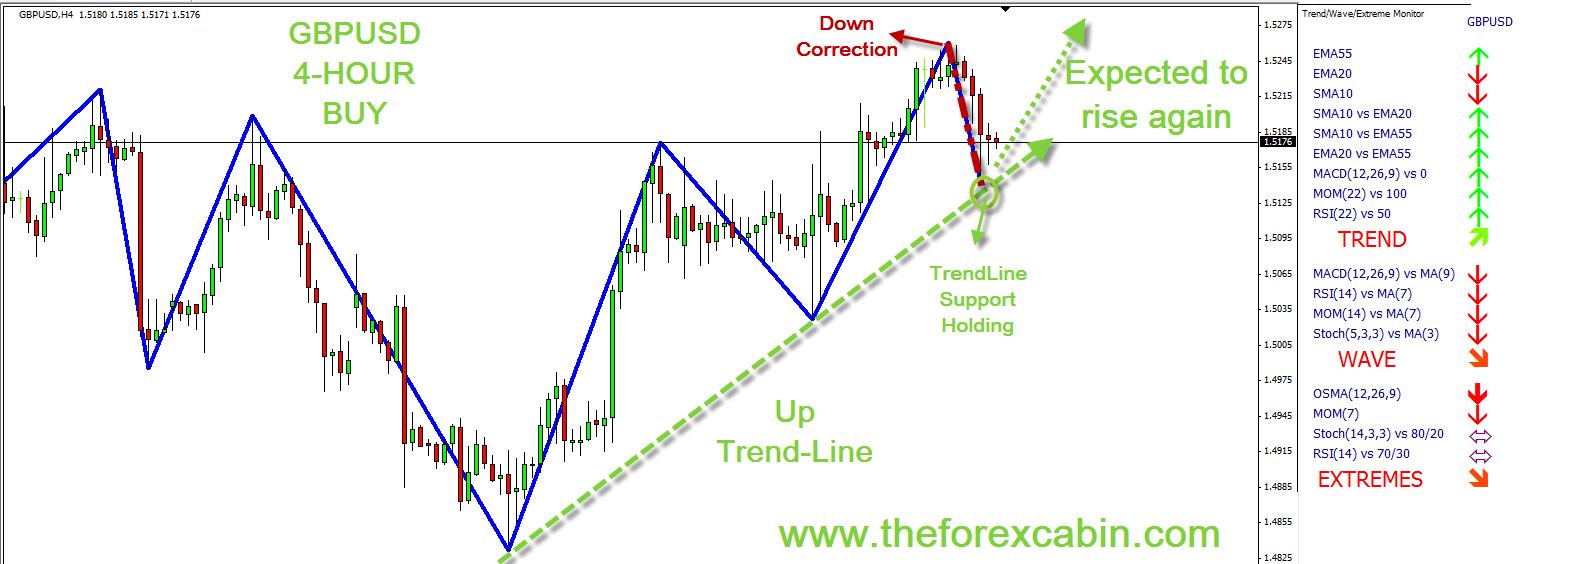 Leading Indicators Forex